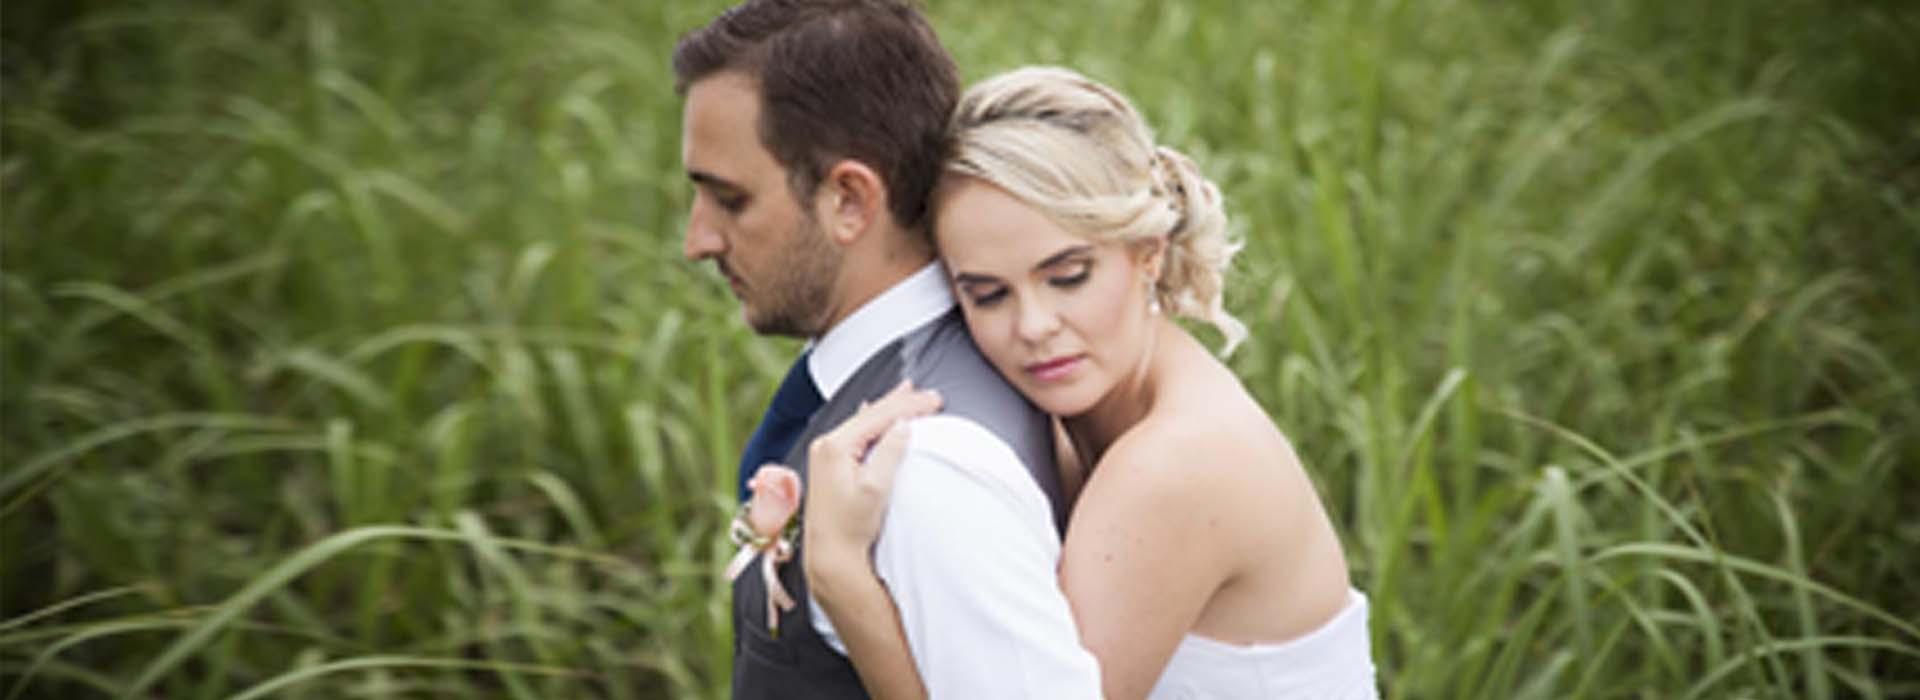 MCKUNE WEDDING